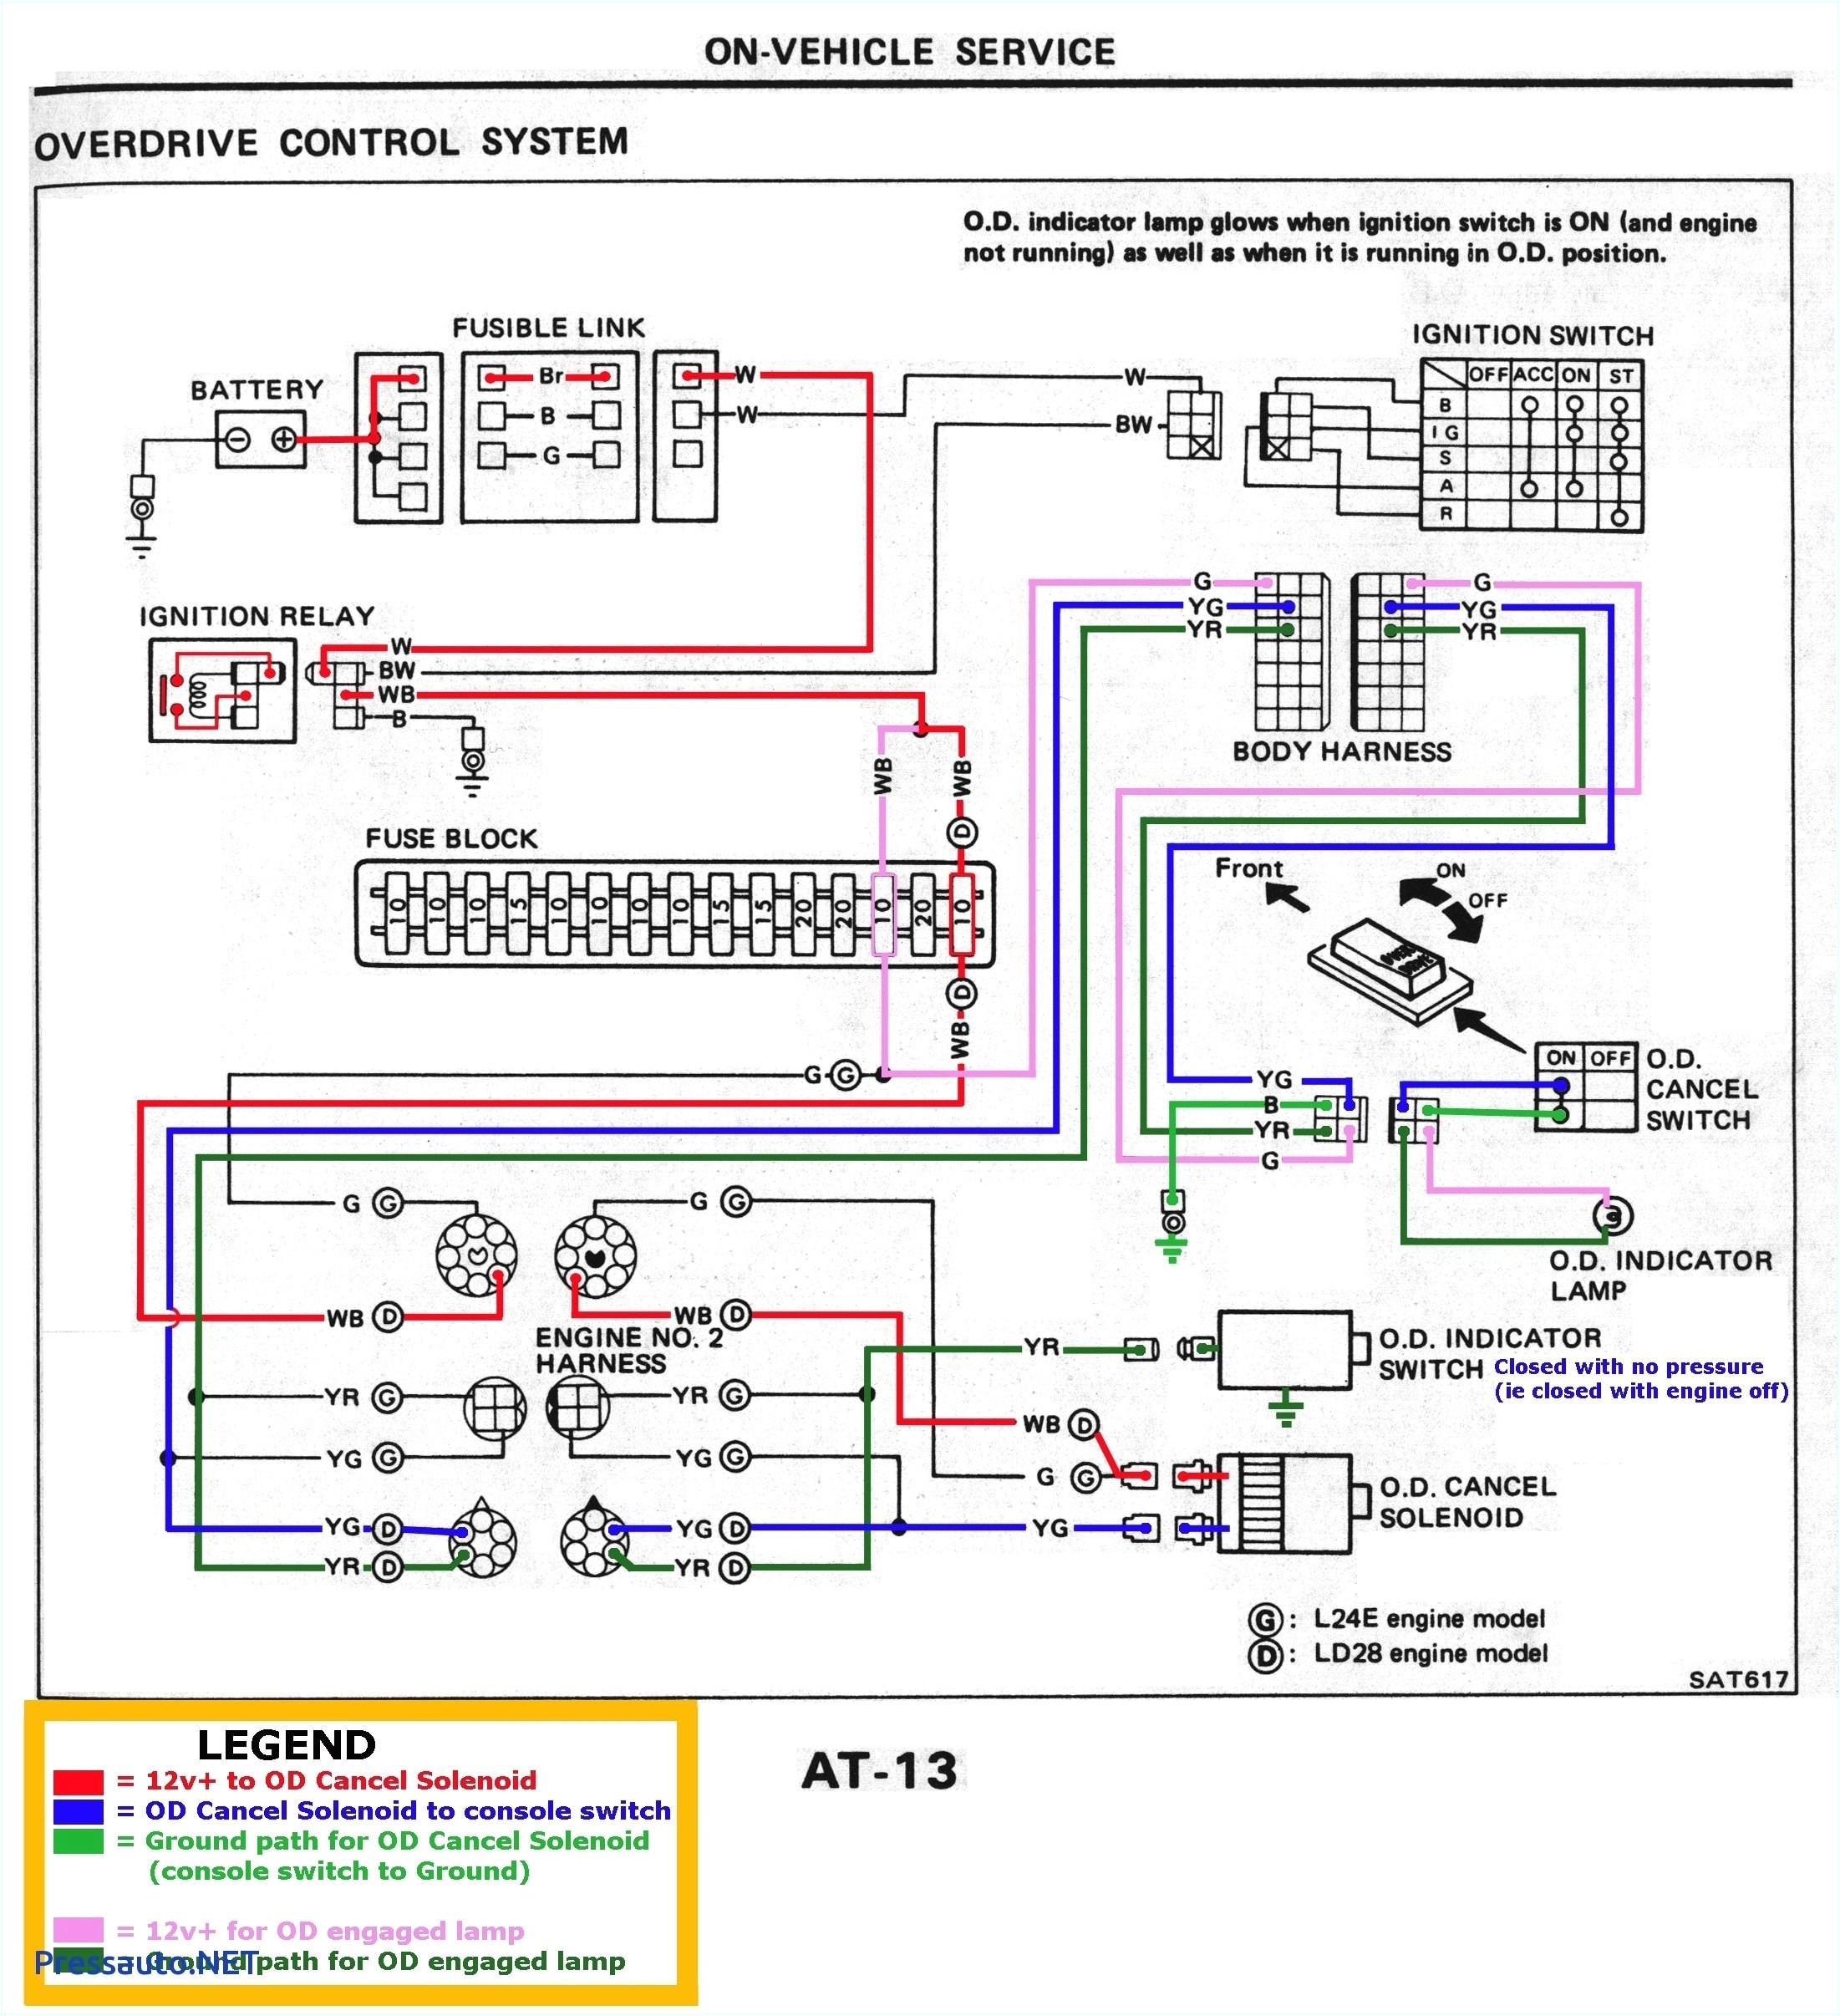 toyota fujitsu ten 86120 wiring diagram 1 wiring diagram source 6797d1355887343dimmerswitchprogram3setswires3wayswitch